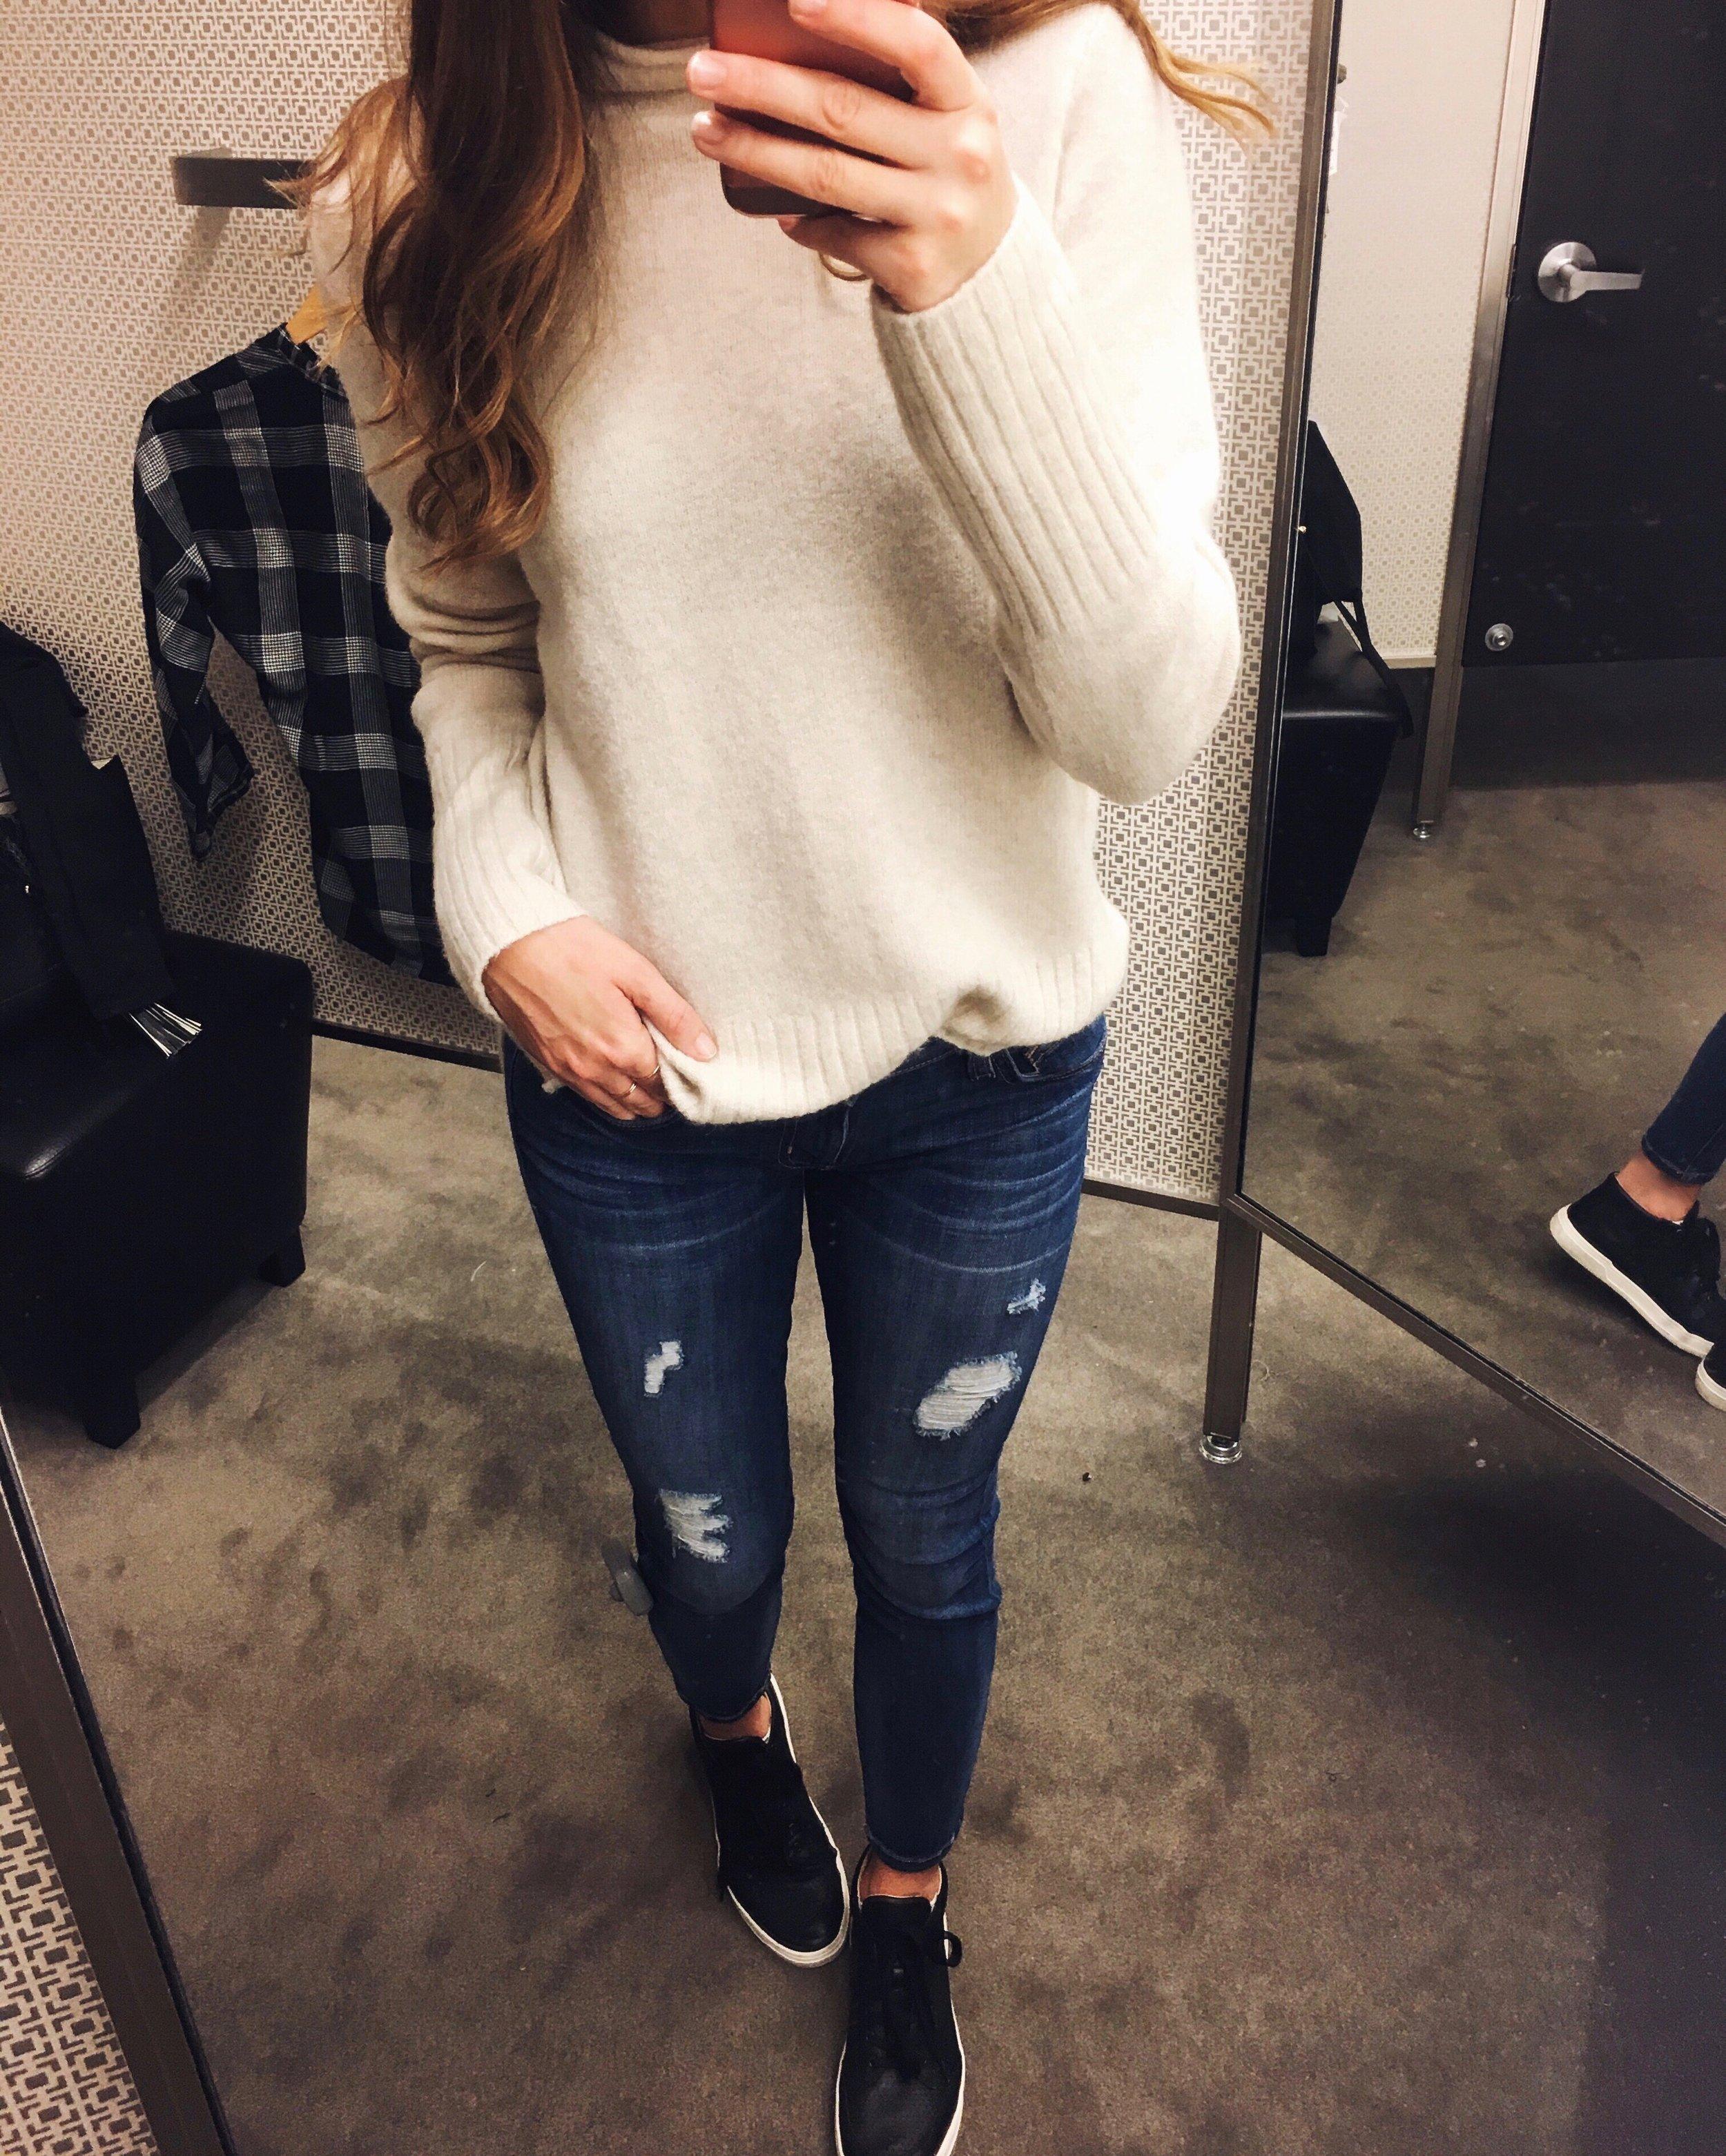 Black Friday Sale Items: Sweater:  Madewell . Jeans:  Current/Elliott